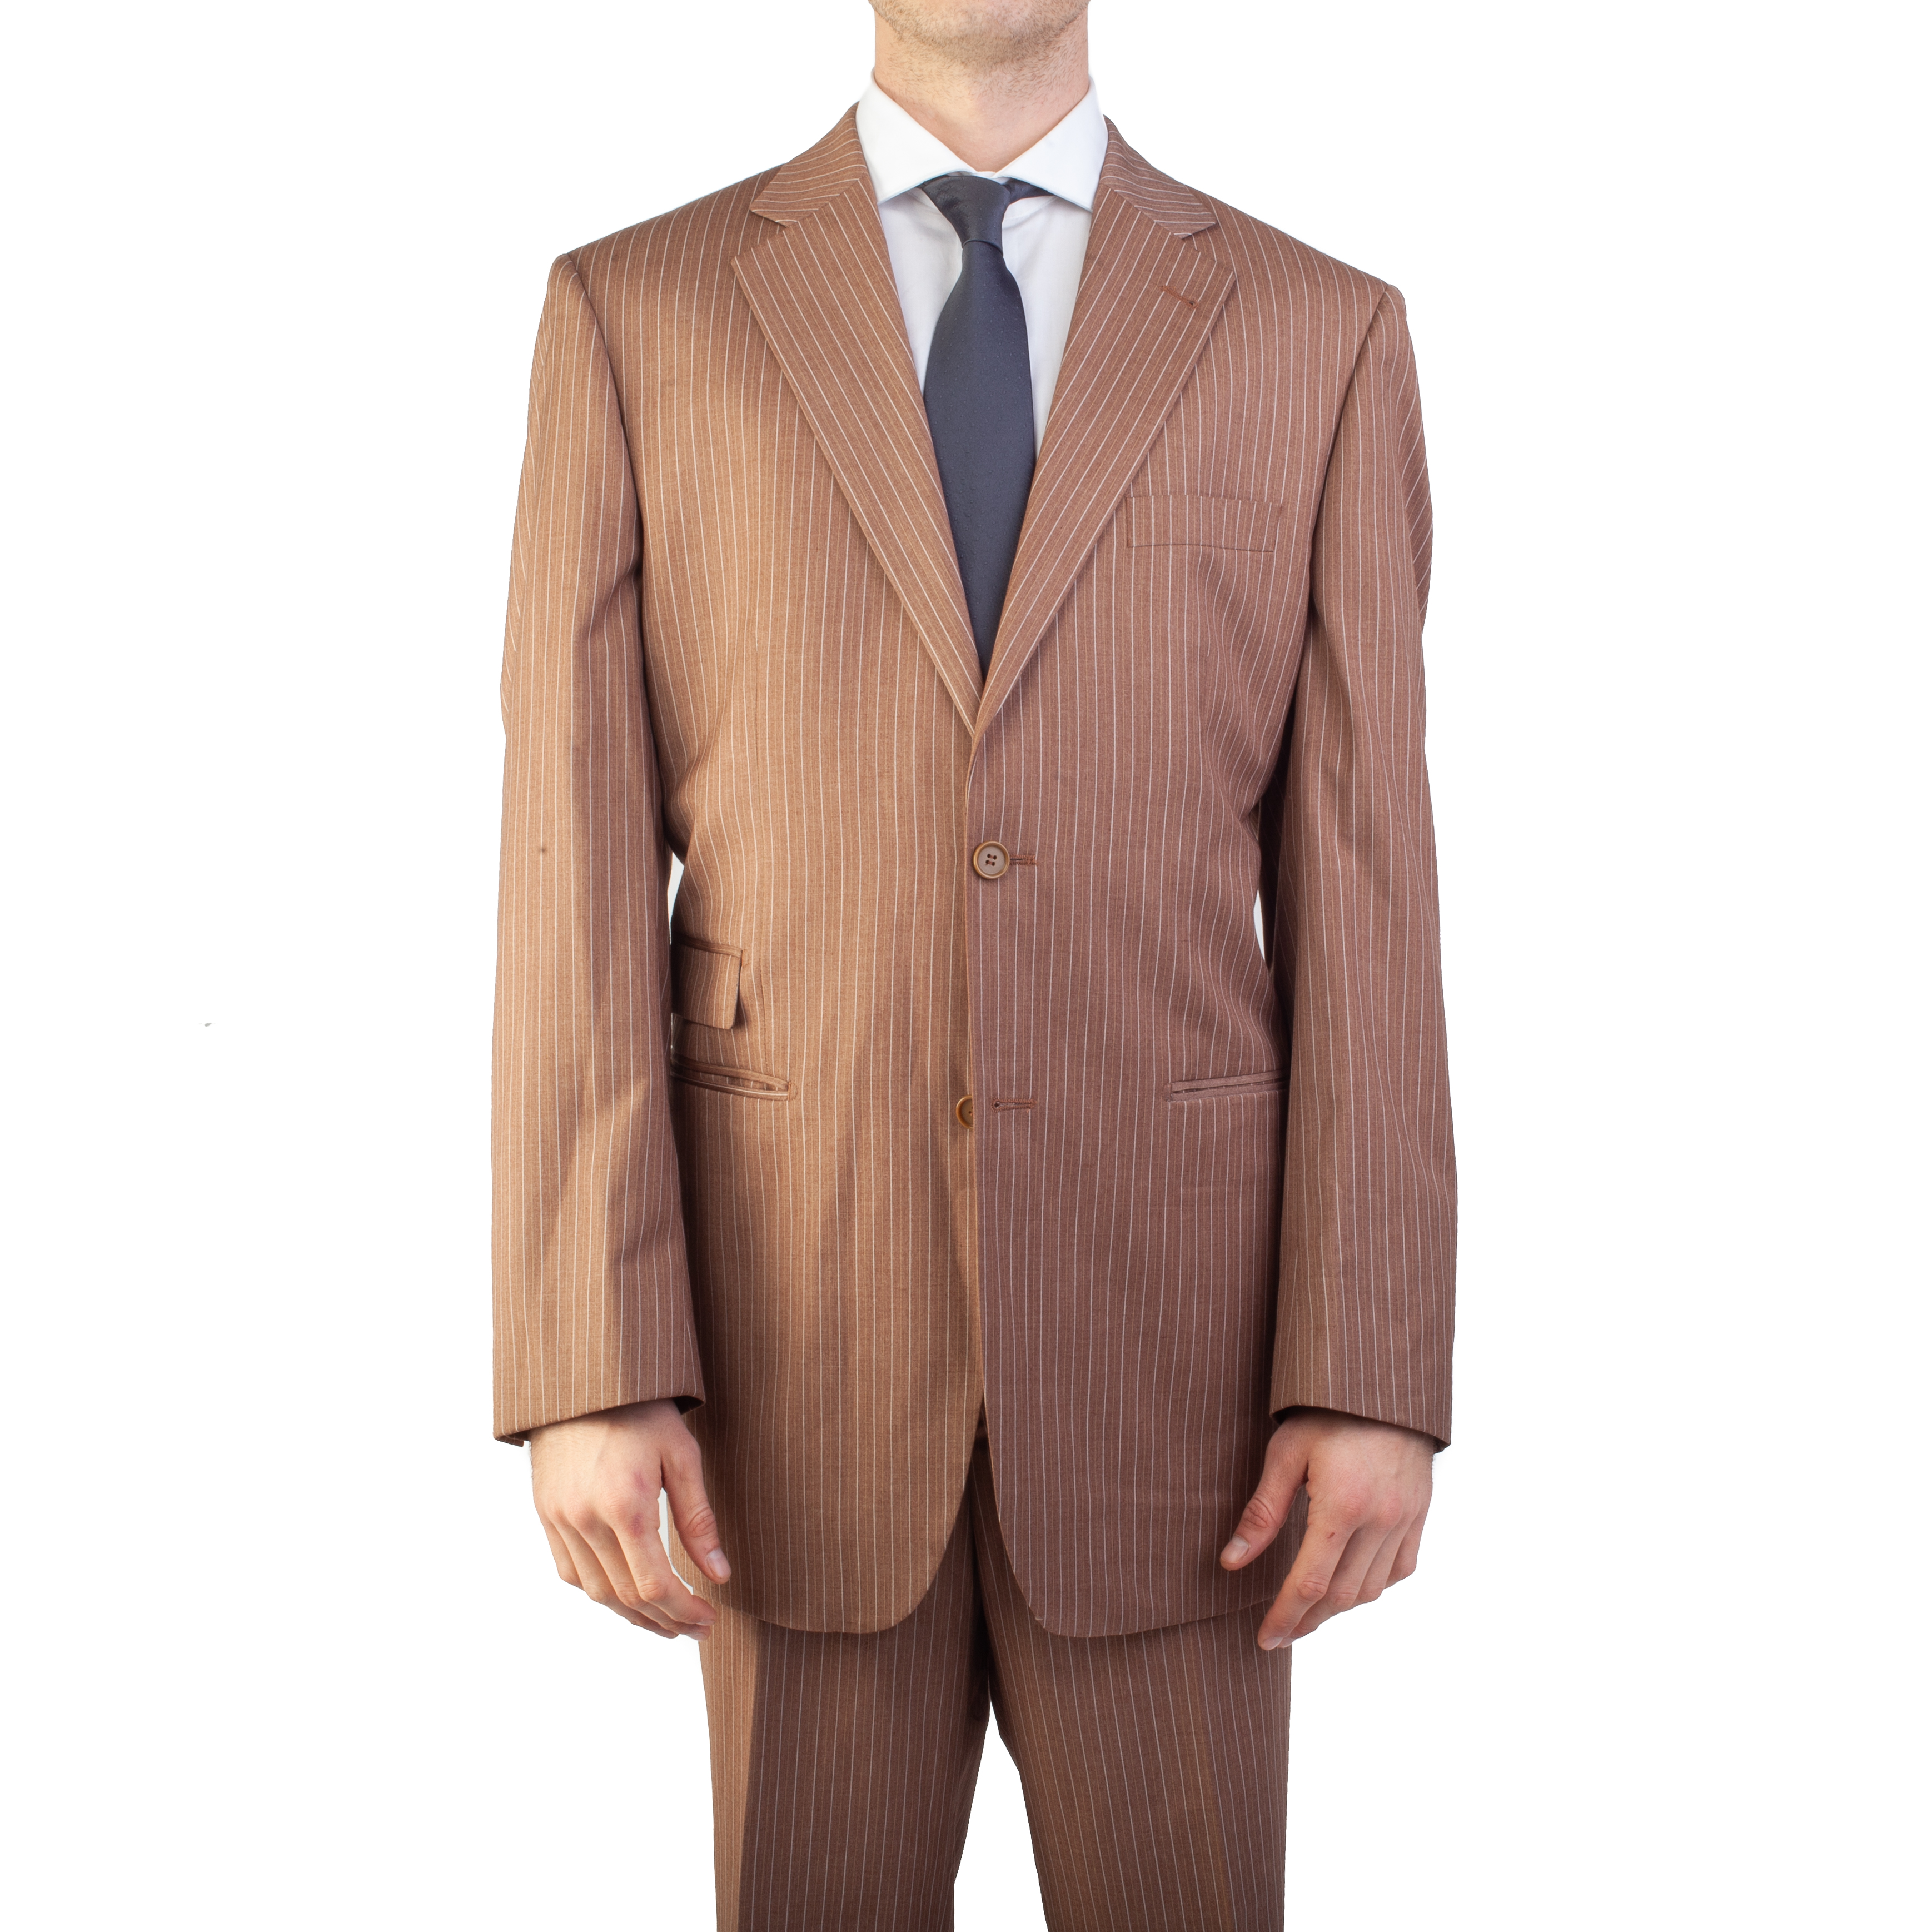 Ferrecci Men's Two Button Pinstripe Polyester Suit Brown